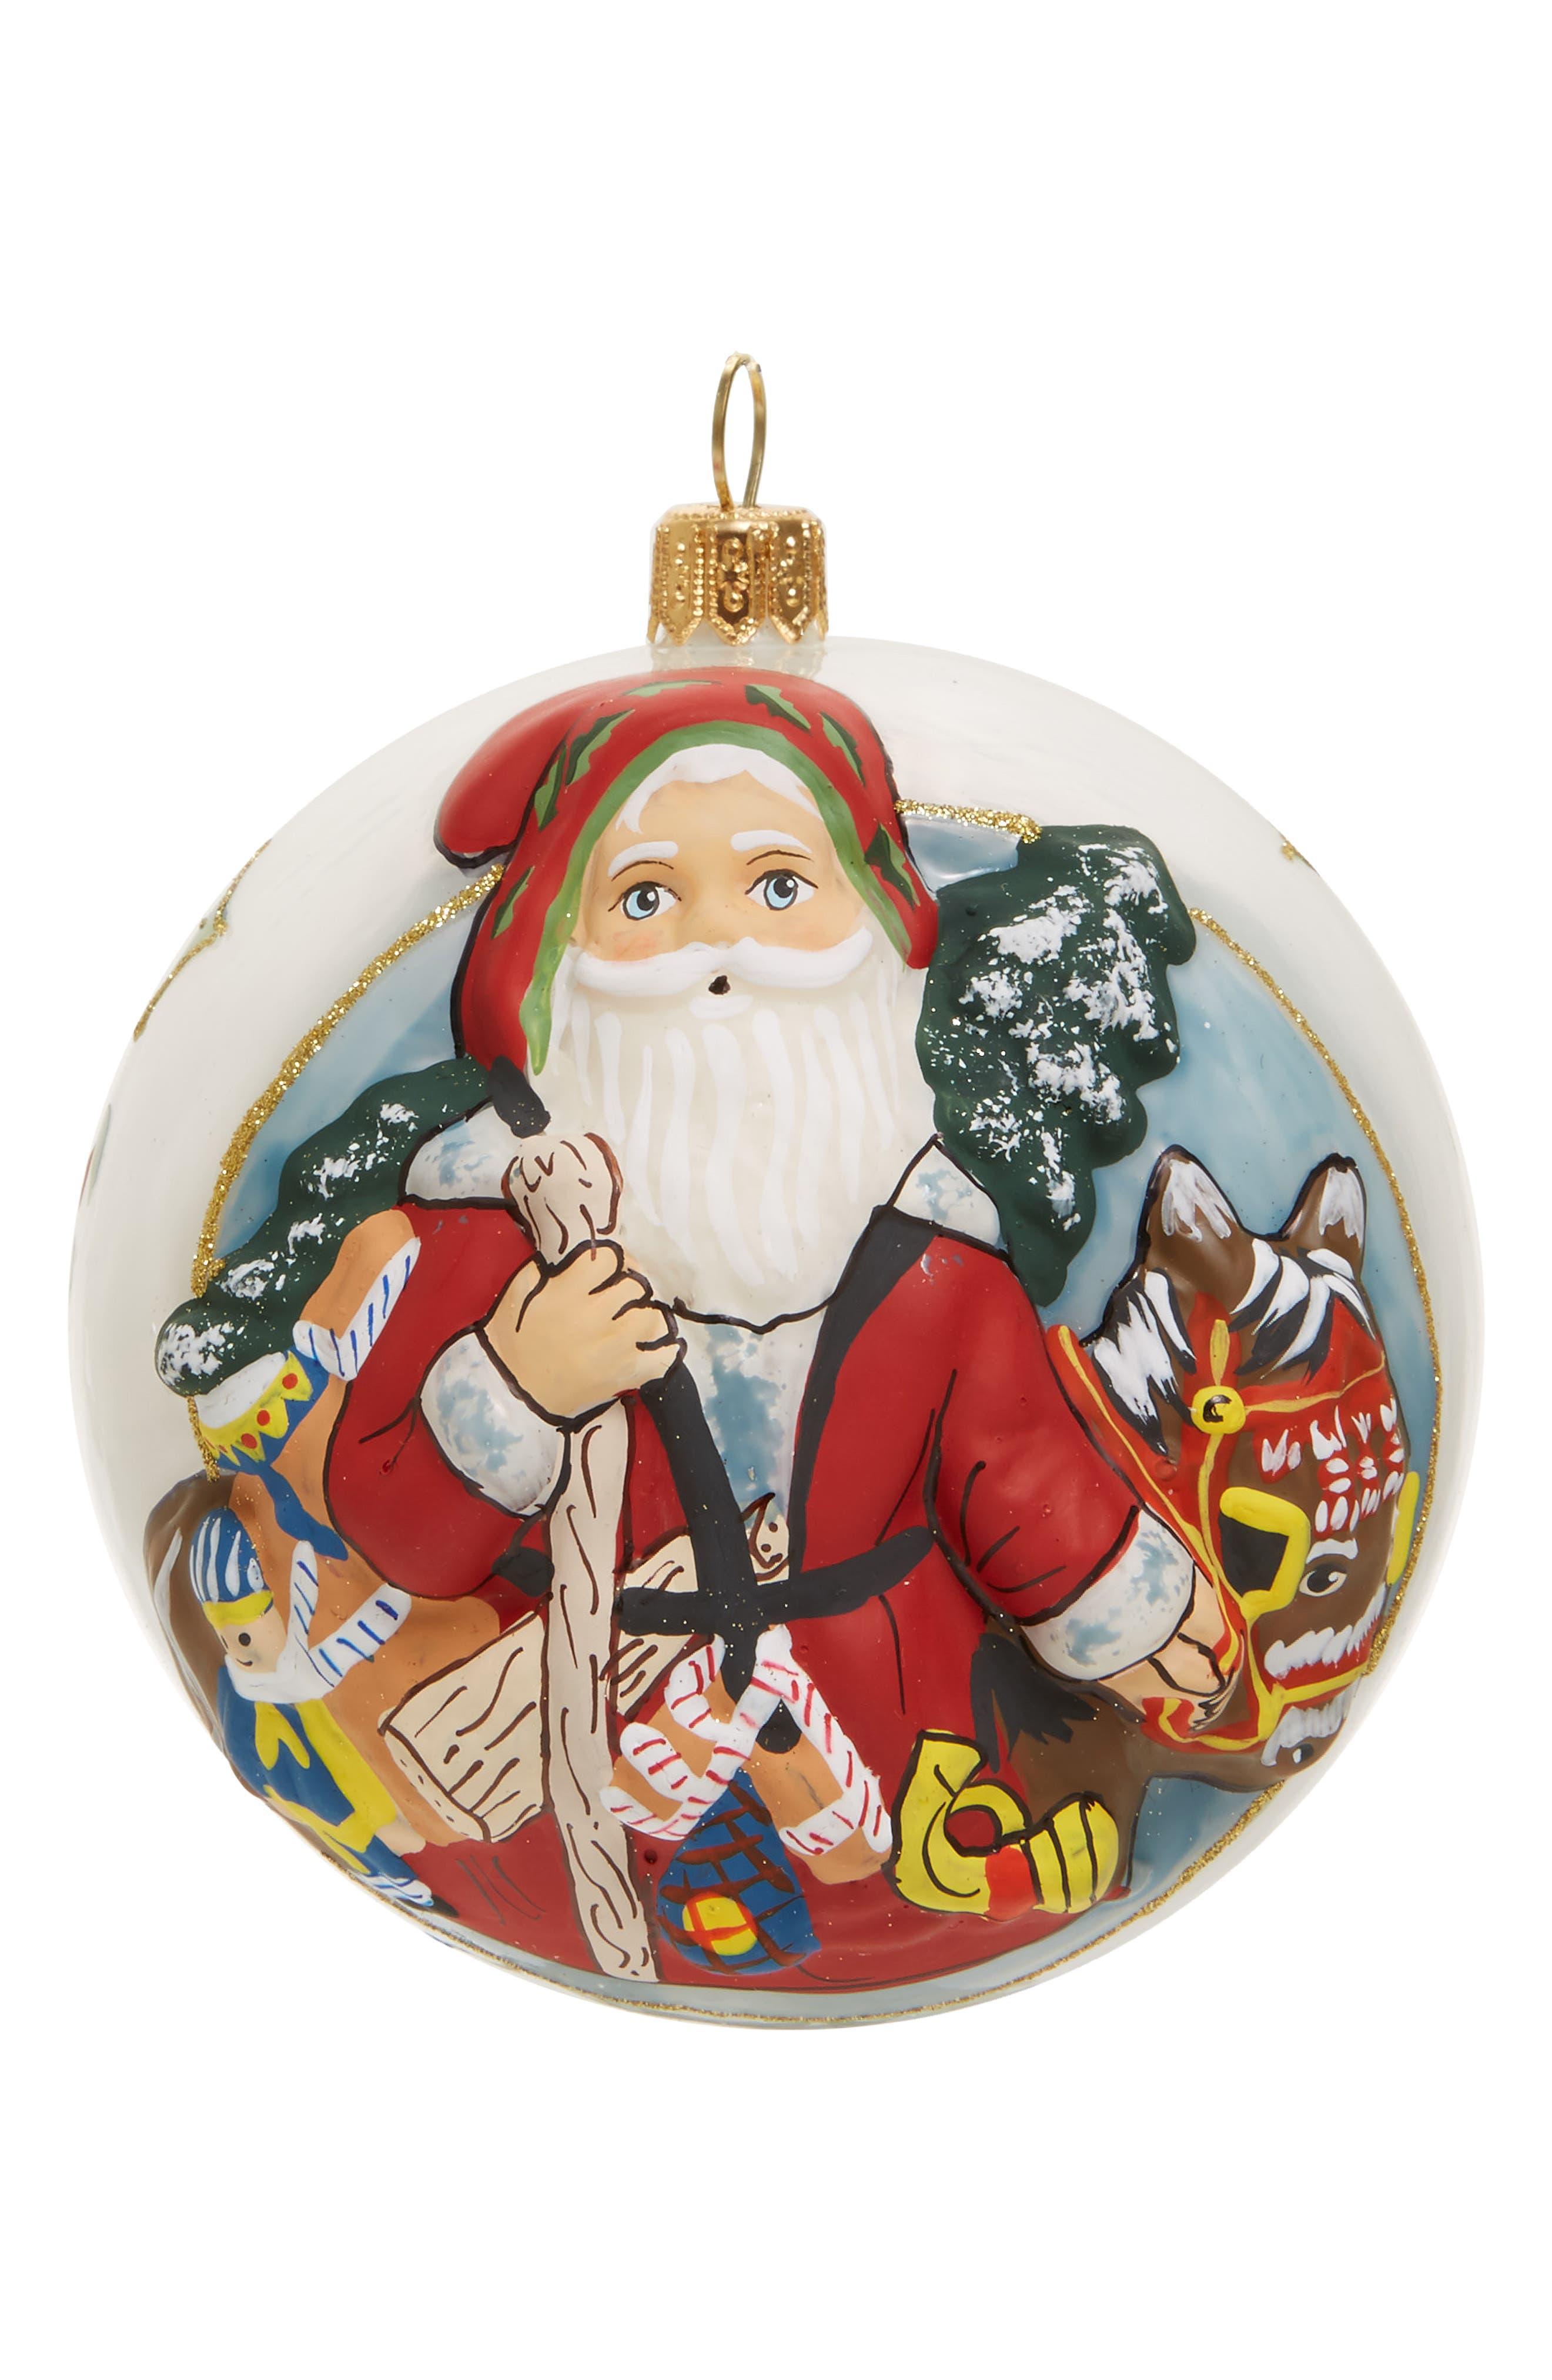 Alternate Image 1 Selected - Vaillancourt Jingle Ball Santa Glass Ornament